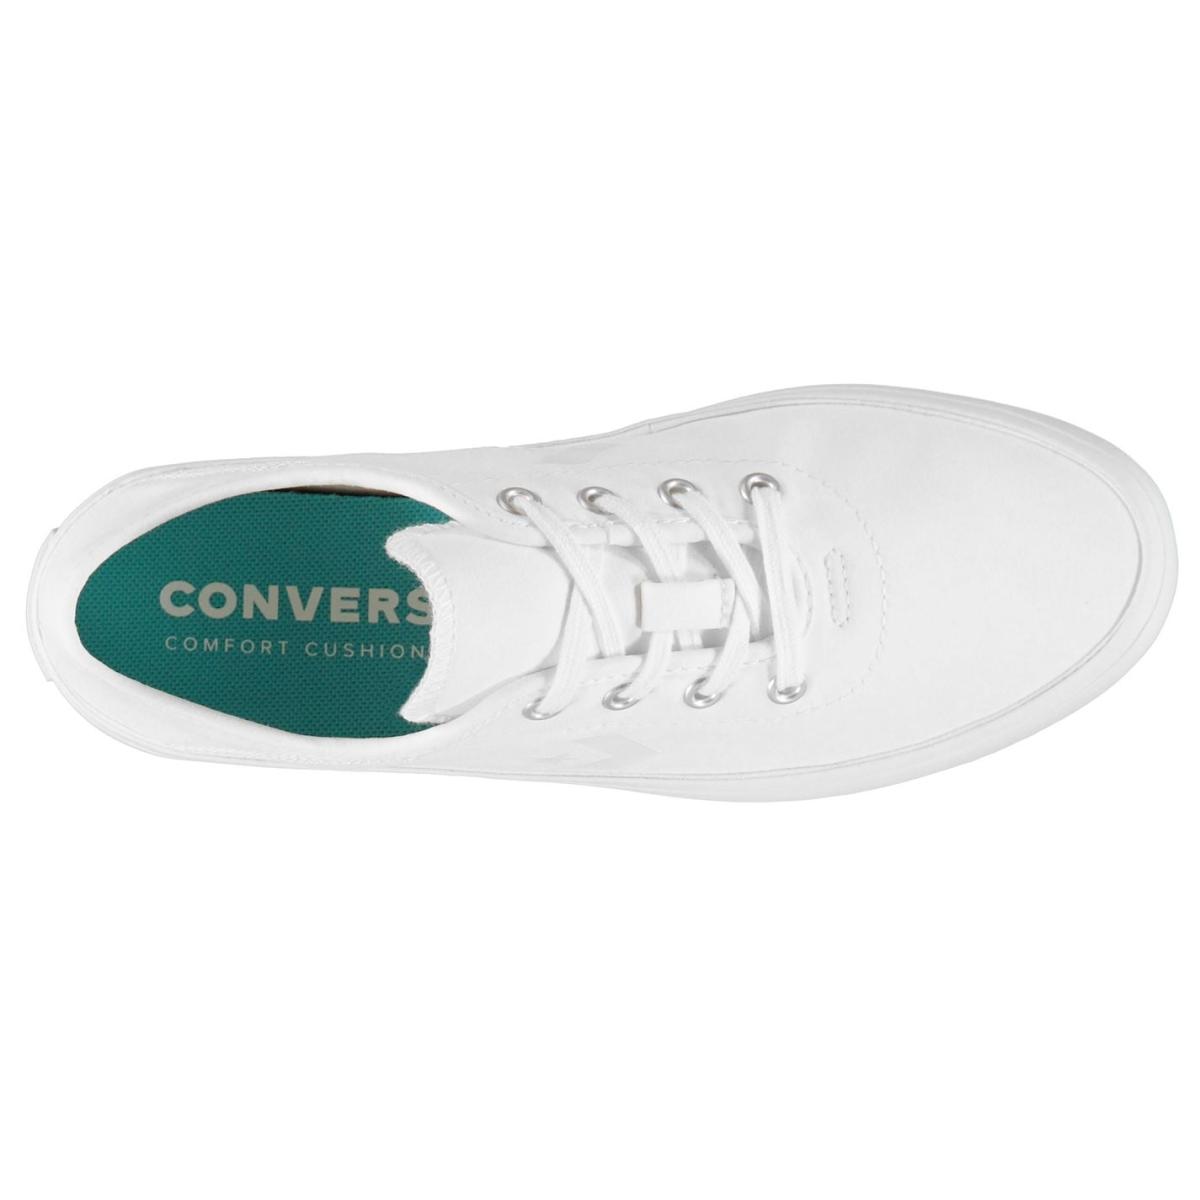 Converse Ox Costa Damen Turnschuhe Sportschuhe Weiß_Weiß